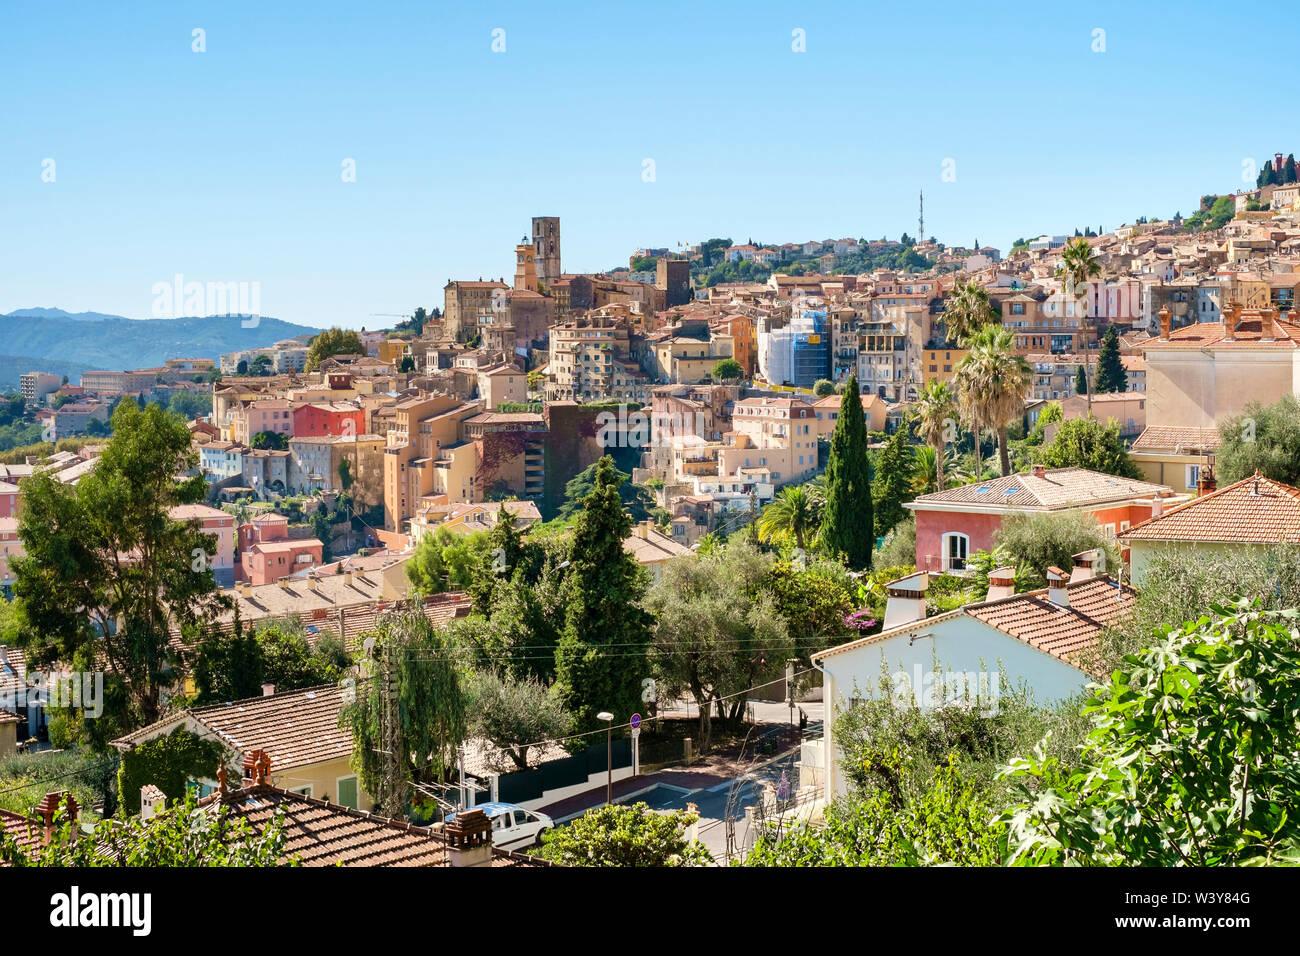 View of hilltop city of Grasse, Alpes-Maritimes, Provence-Alpes-Côte d'Azur, France. - Stock Image